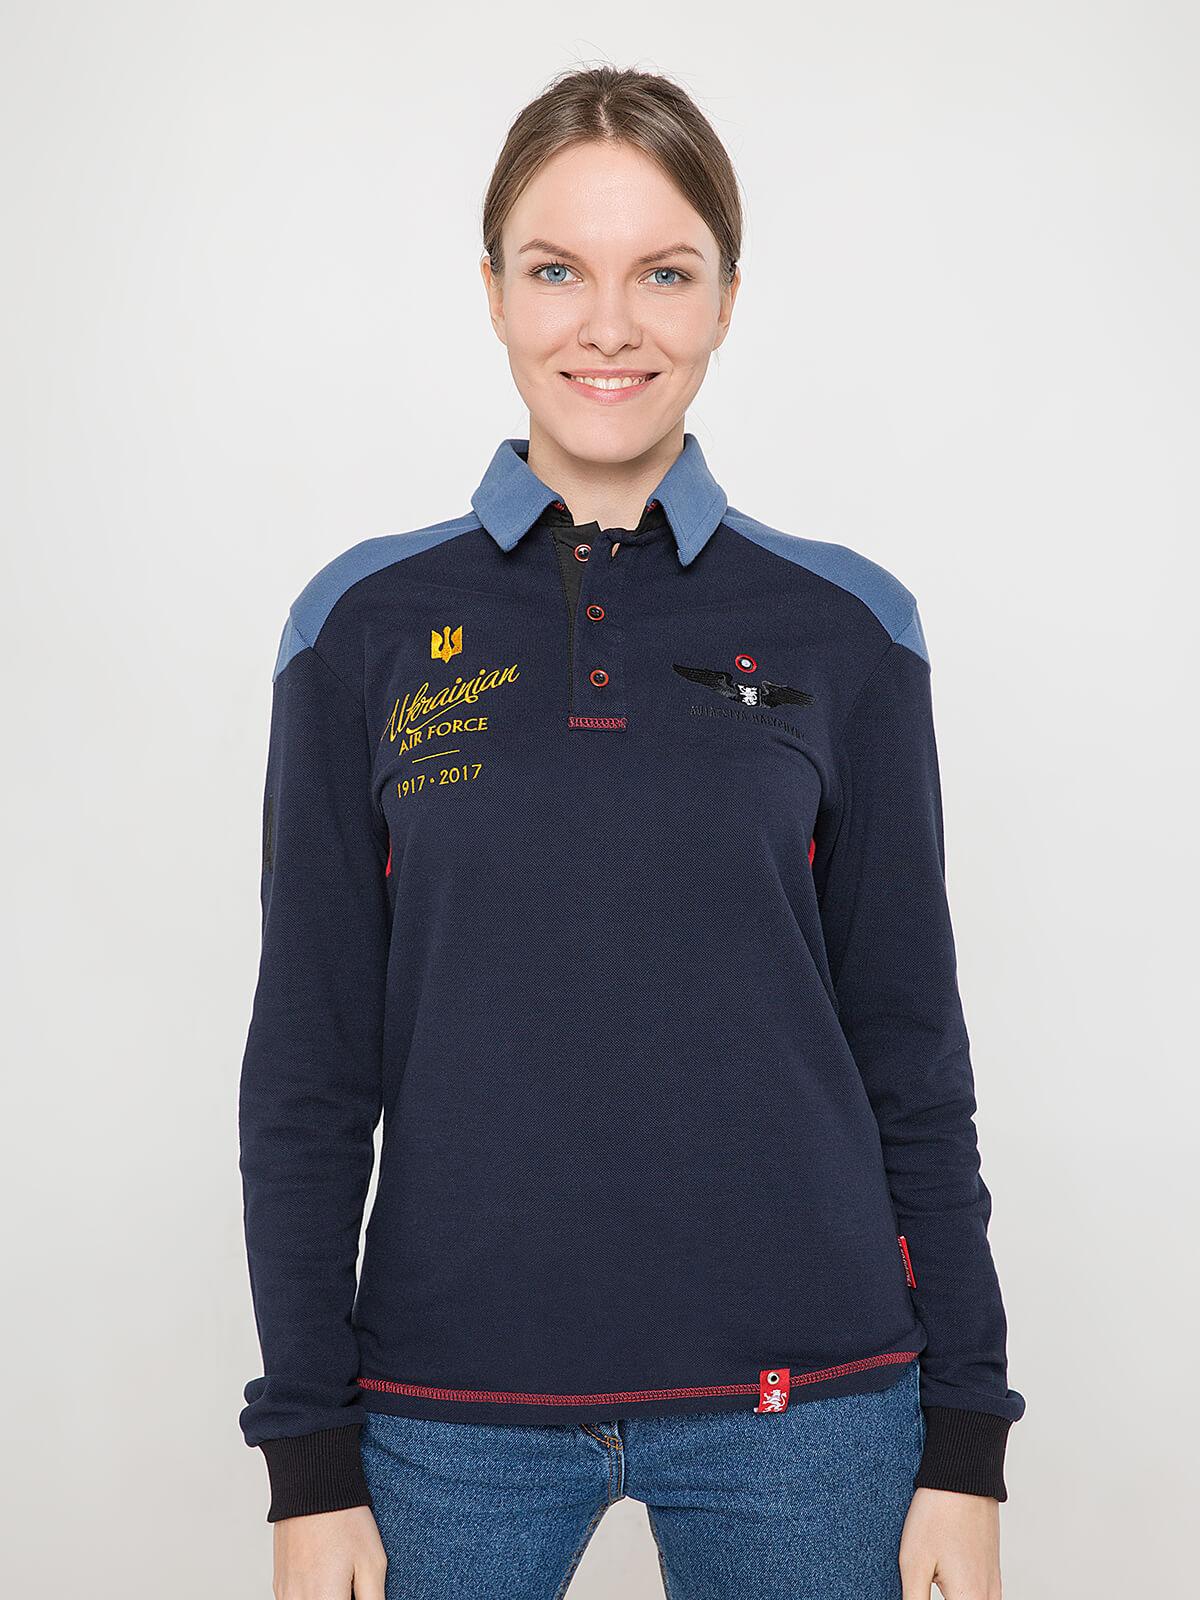 Women's Polo Long 100 Years Of Ua. Color dark blue. Unisex polo (men's sizes).